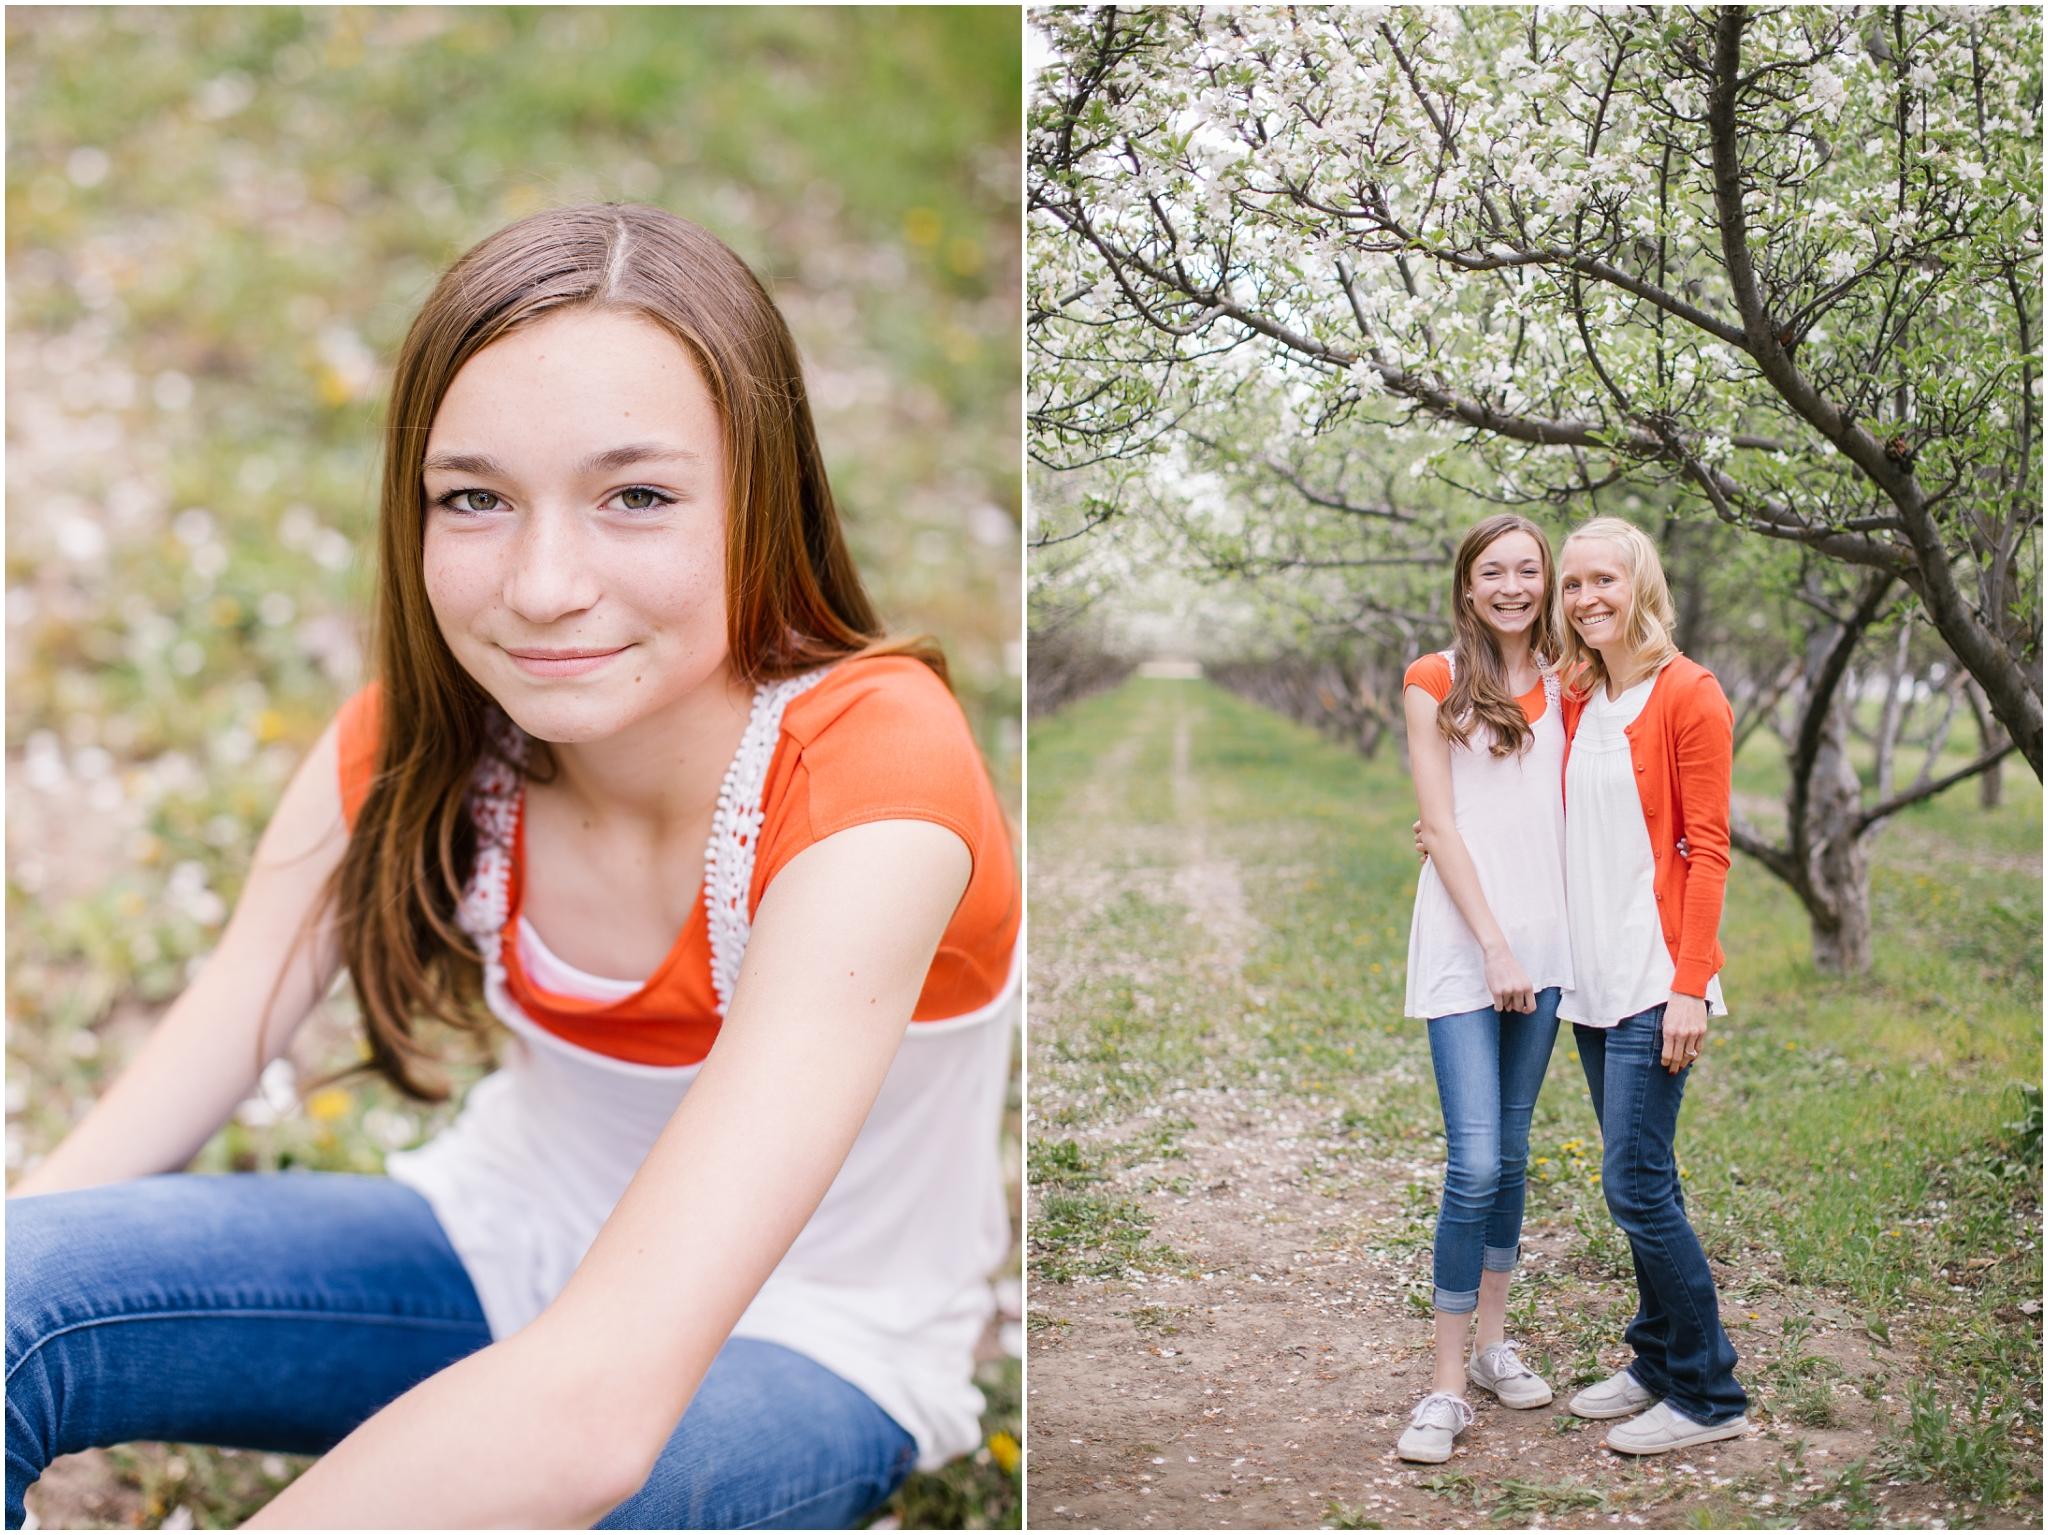 Millar-43_Lizzie-B-Imagery-Utah-Family-Photographer-Salt-Lake-City-Park-City-utah-state-hospital.jpg